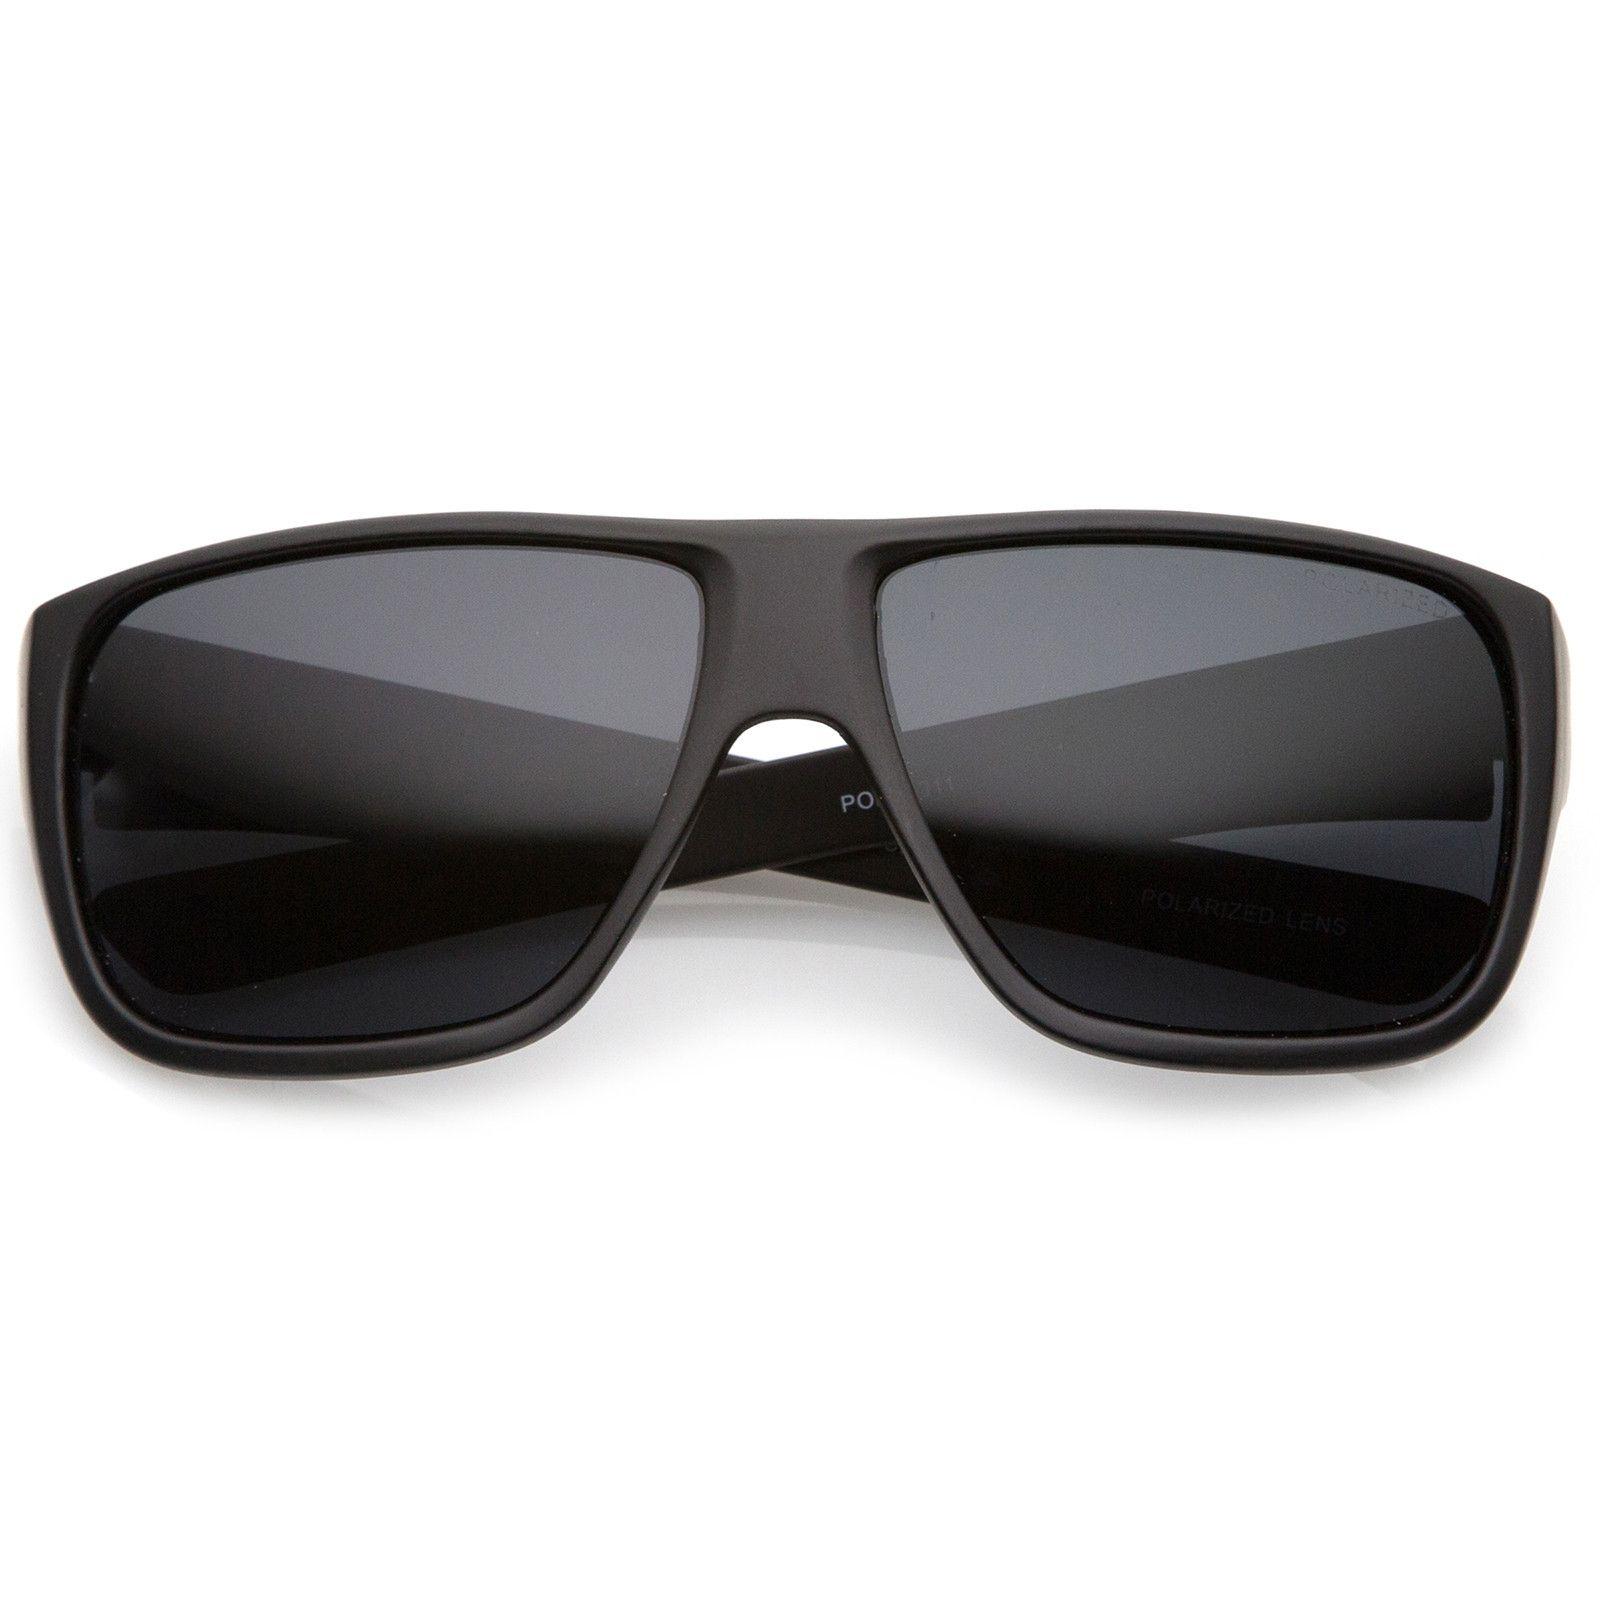 3599d38fd Men's Oversize Flat Top Wide Temple Polarized Lens Square Sunglasses 62mm  #bold #sunglasses #frame #sunglass #purple #oversized #womens #cateye  #mirrored # ...